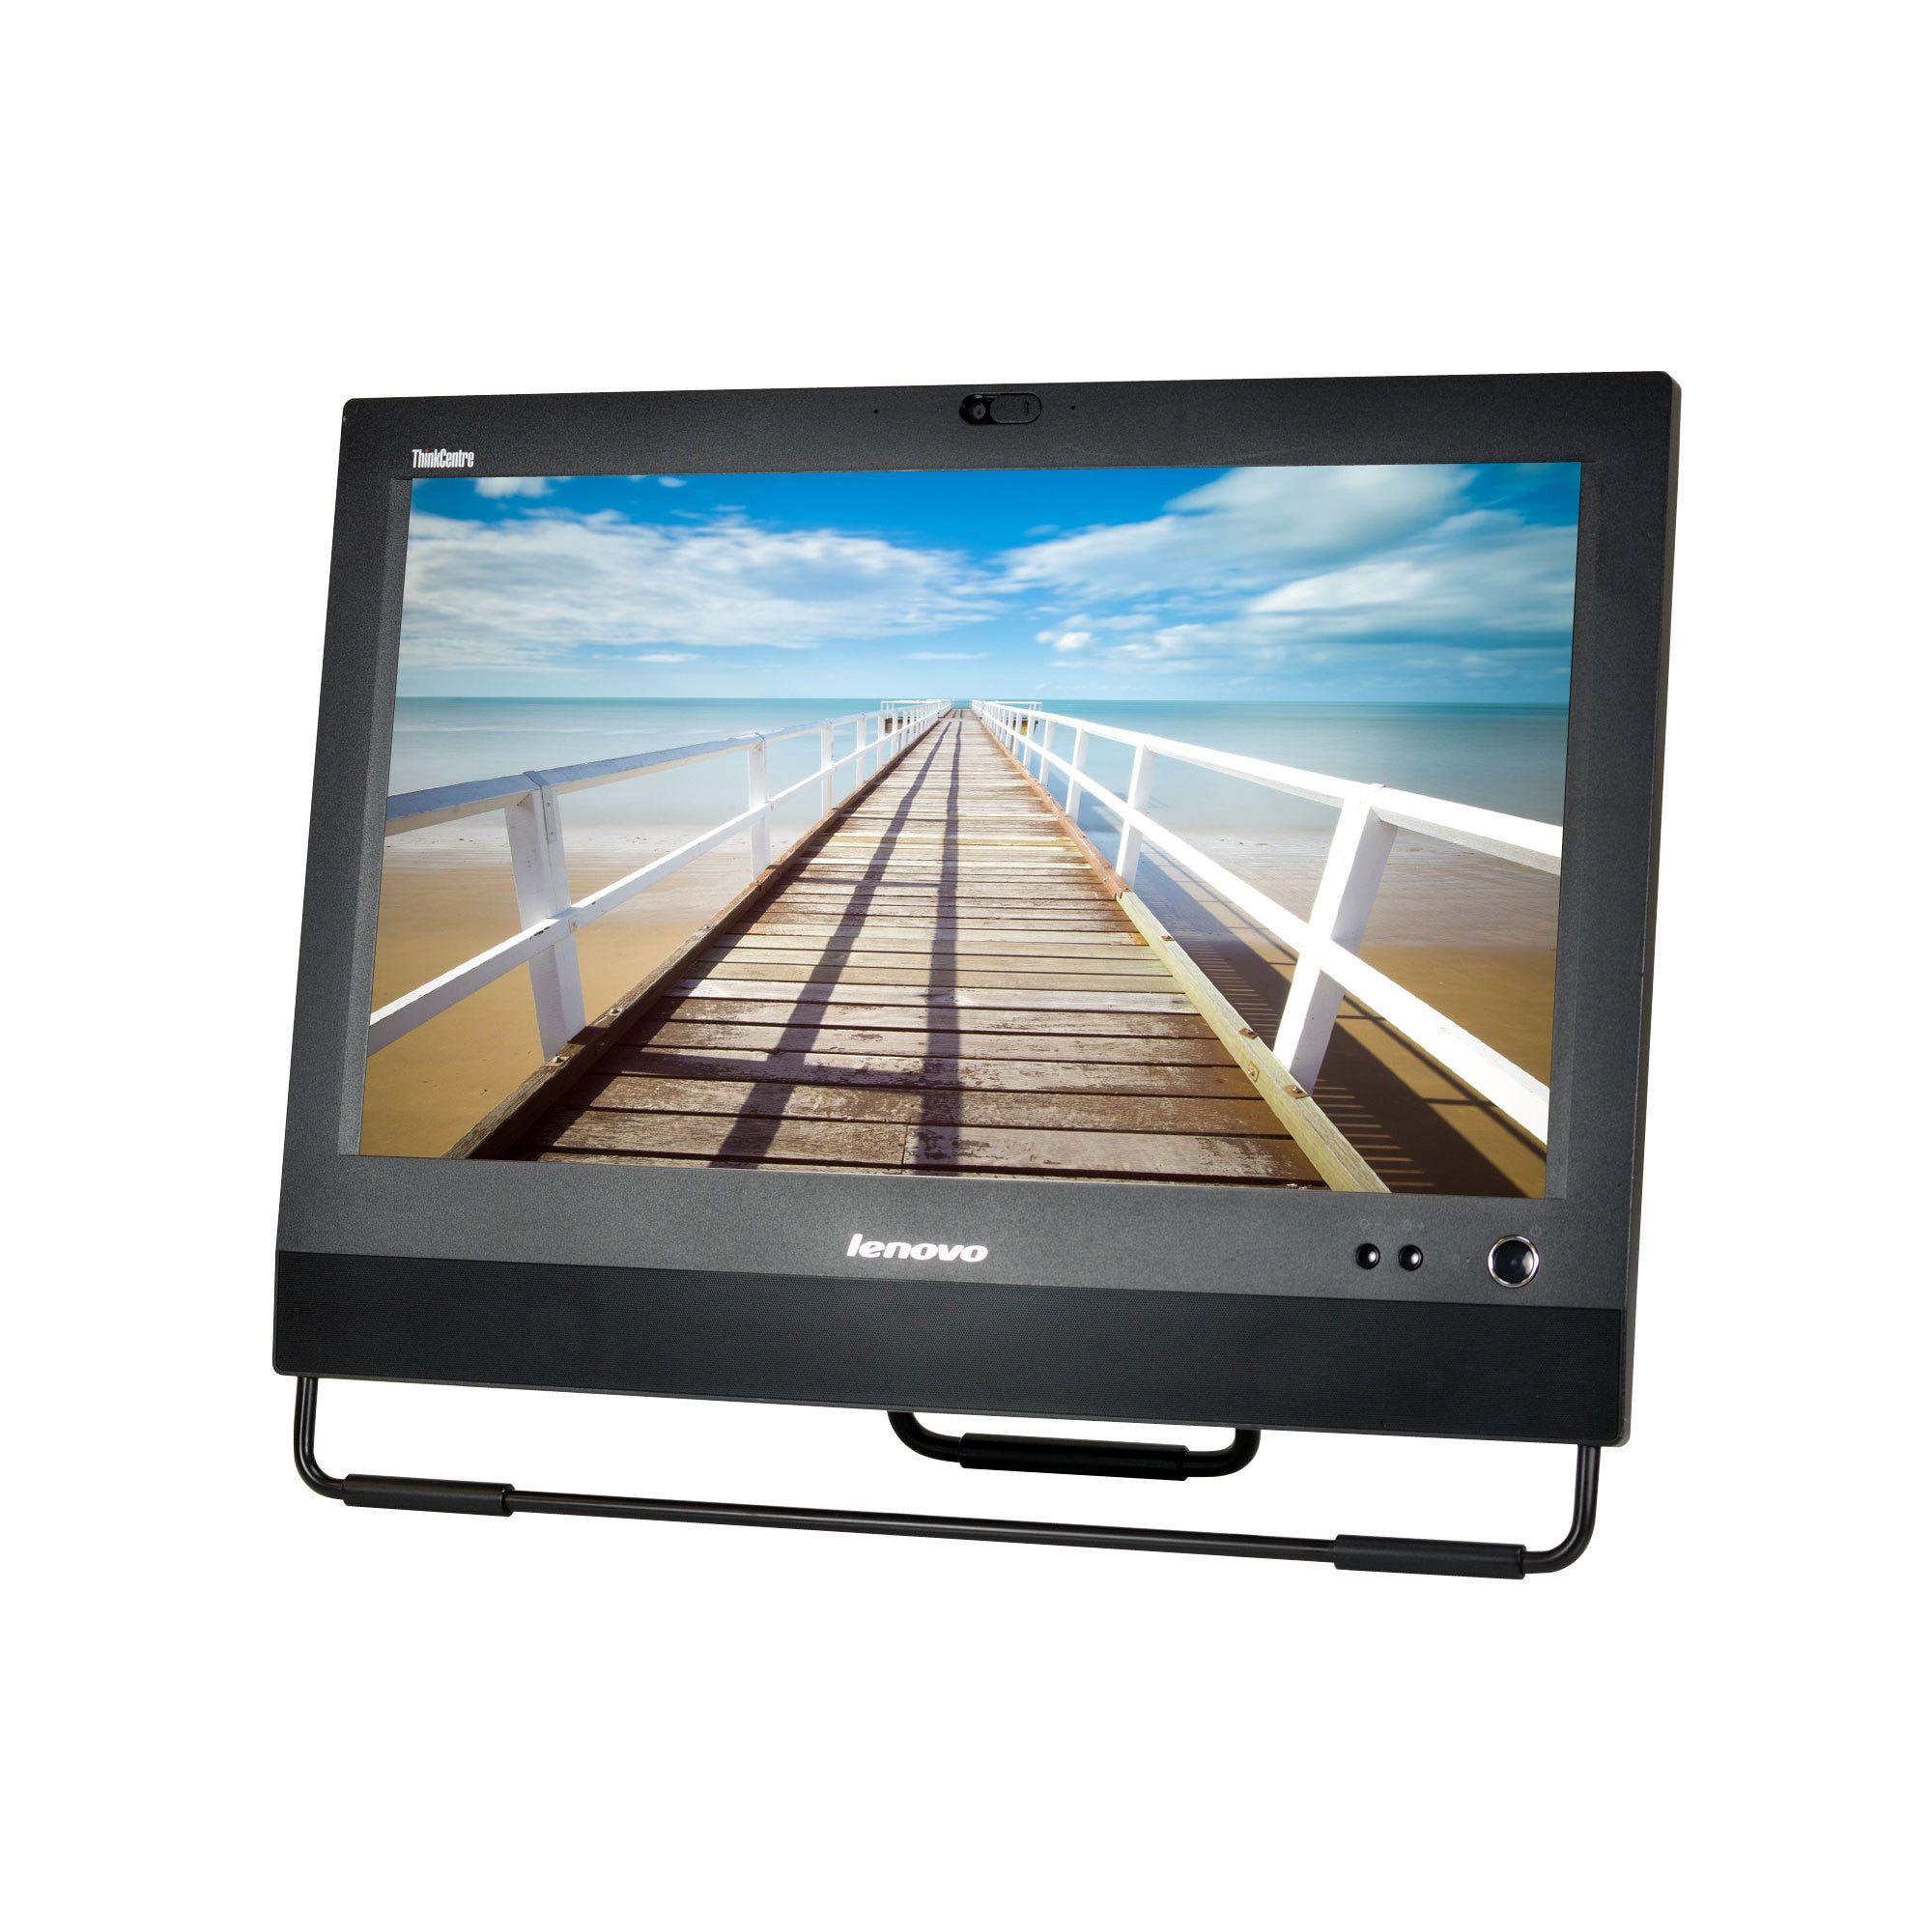 Lenovo ThinkCentre M72z-AIO Core i5-3470S 2.9GHz 3rd Gen CPU 4GB RAM 500GB HDD Windows 10 Pro 20-inch display